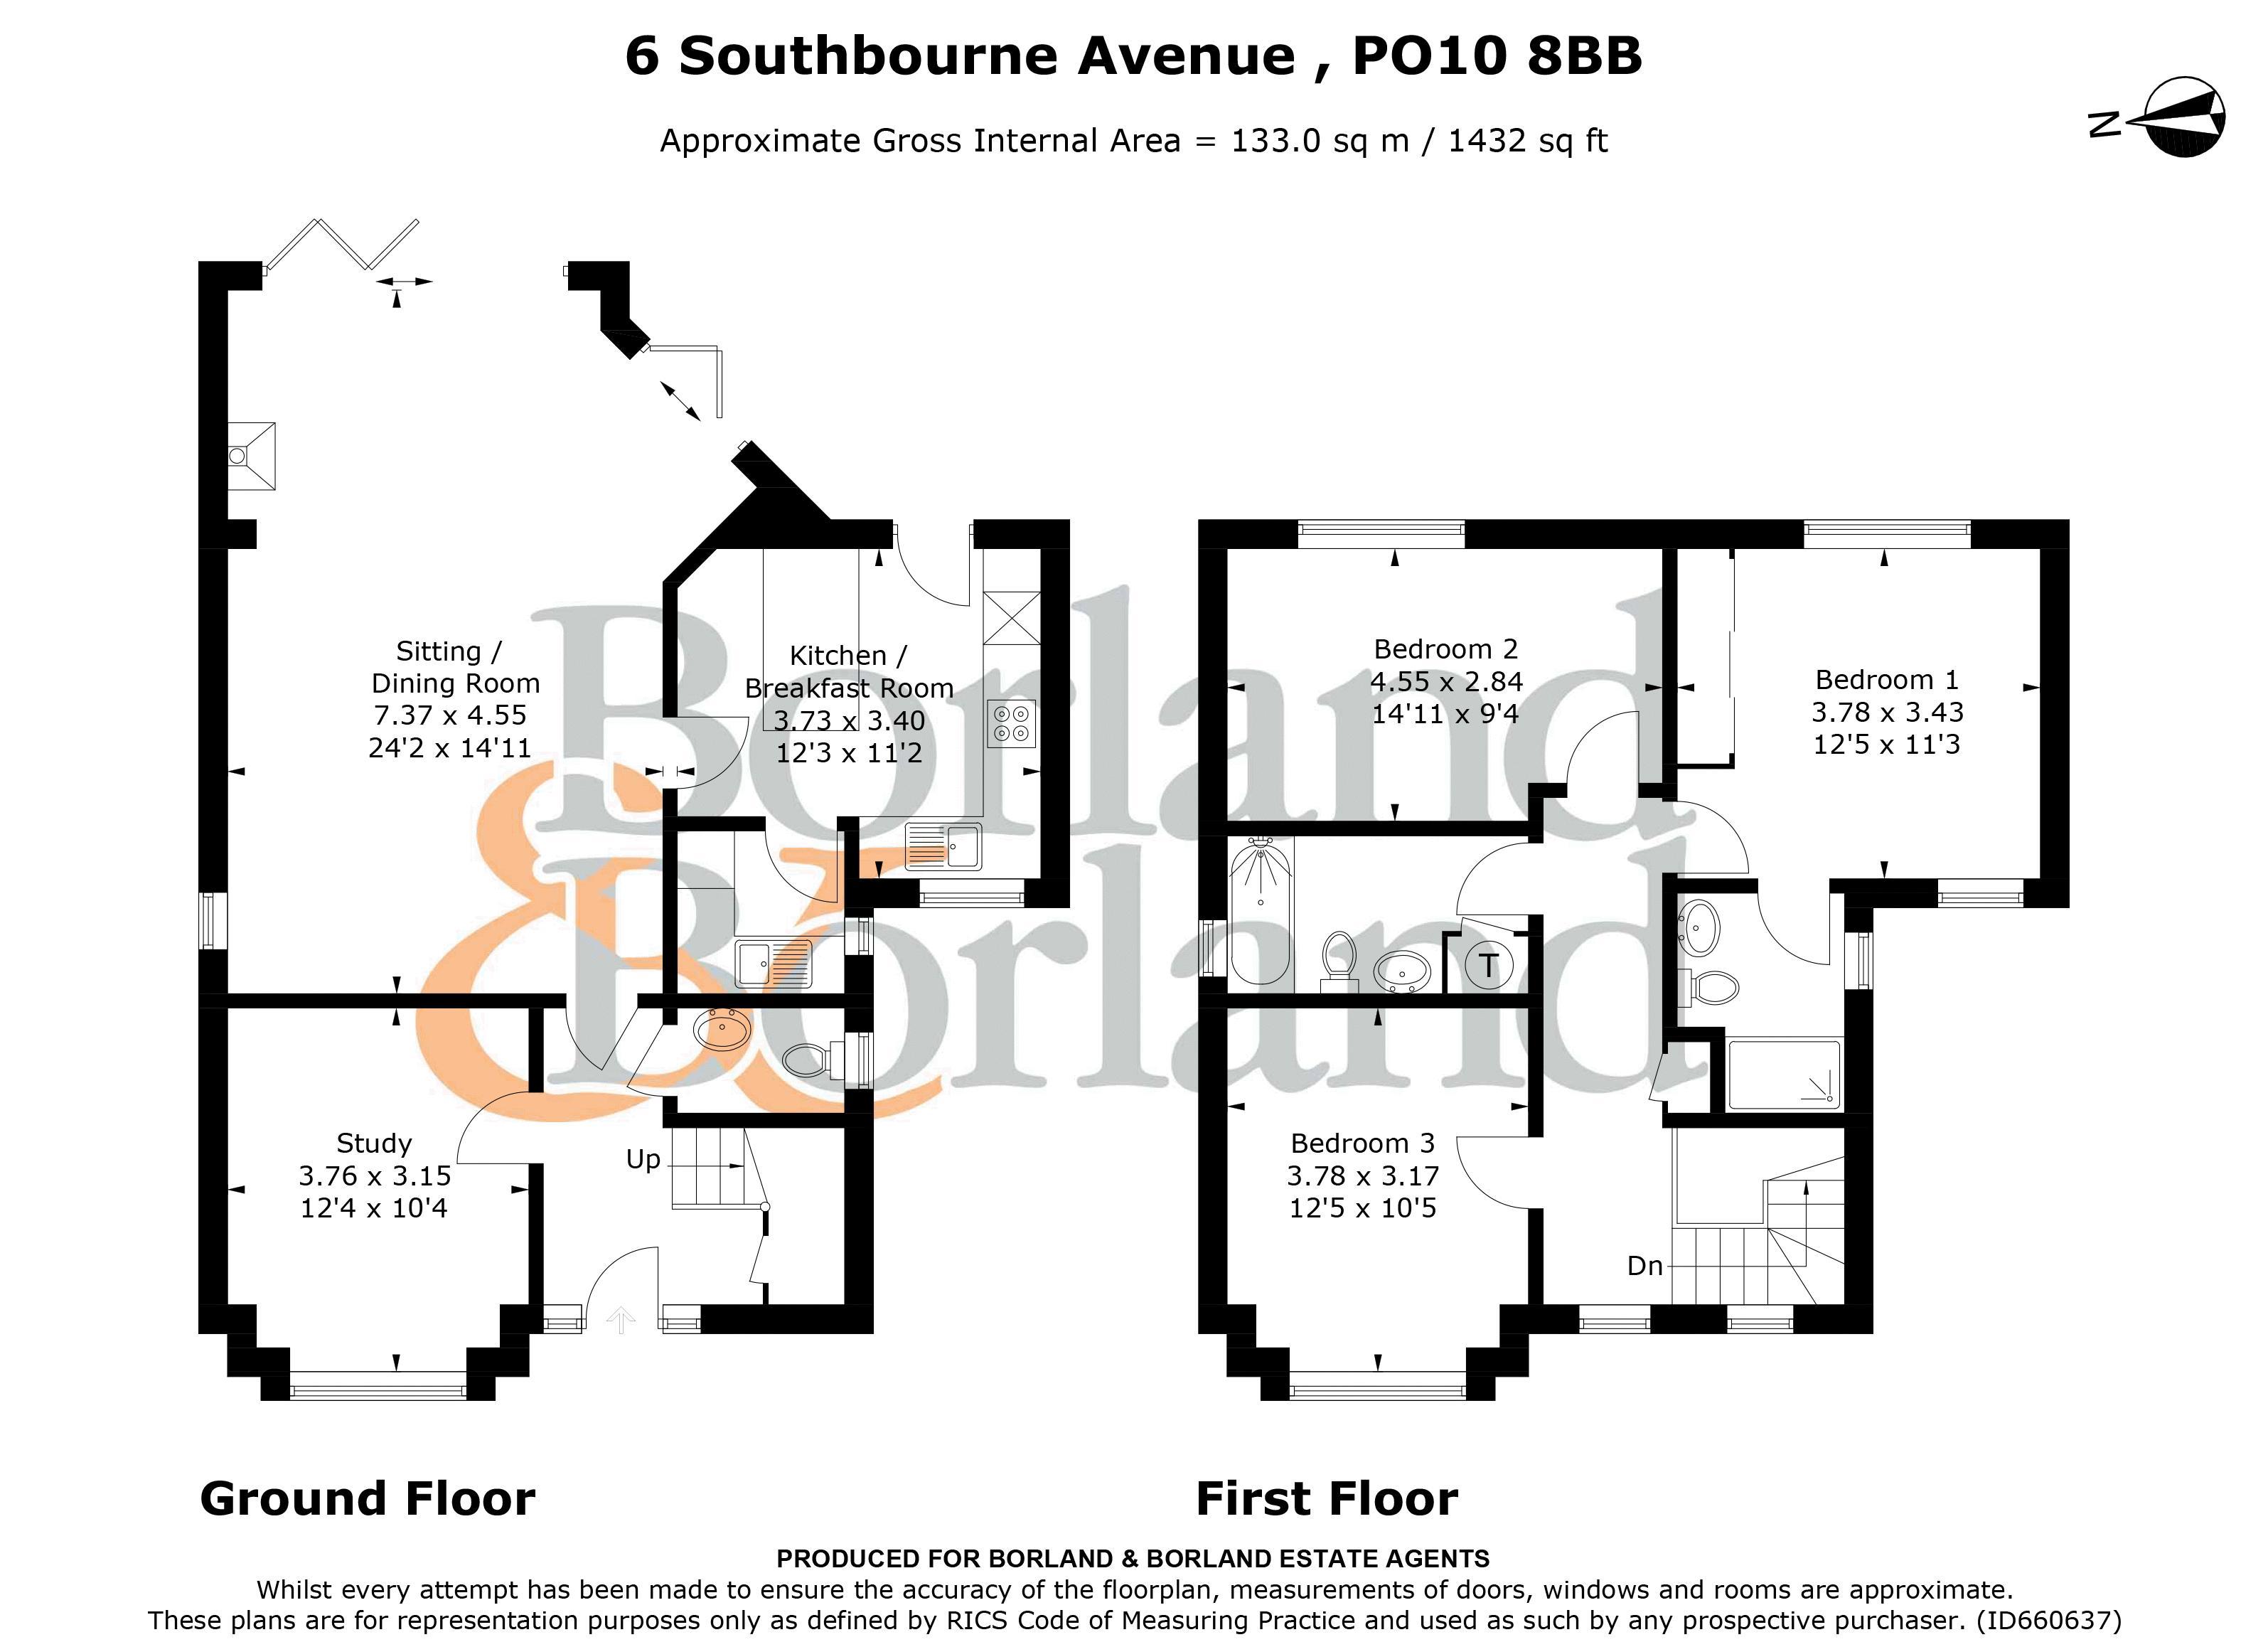 6 Southbourne Avenue